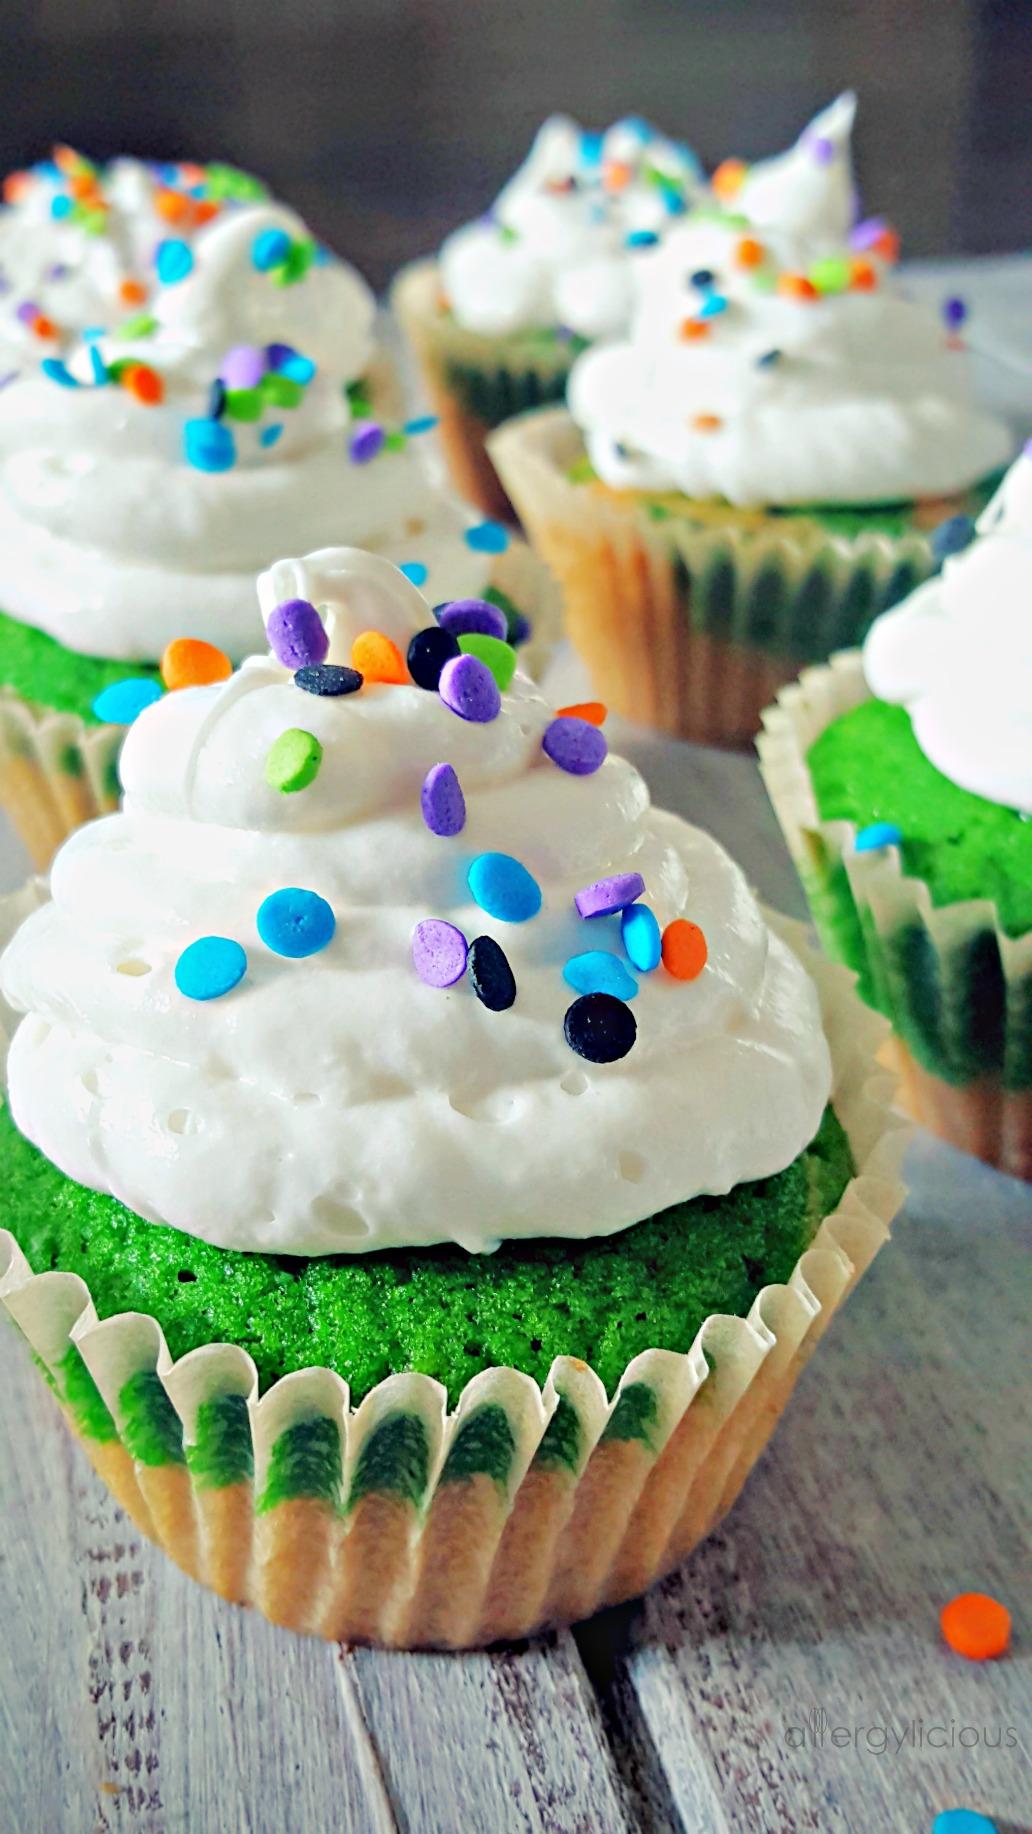 Light & Fluffy Vanilla cupcakes made with Aquafaba